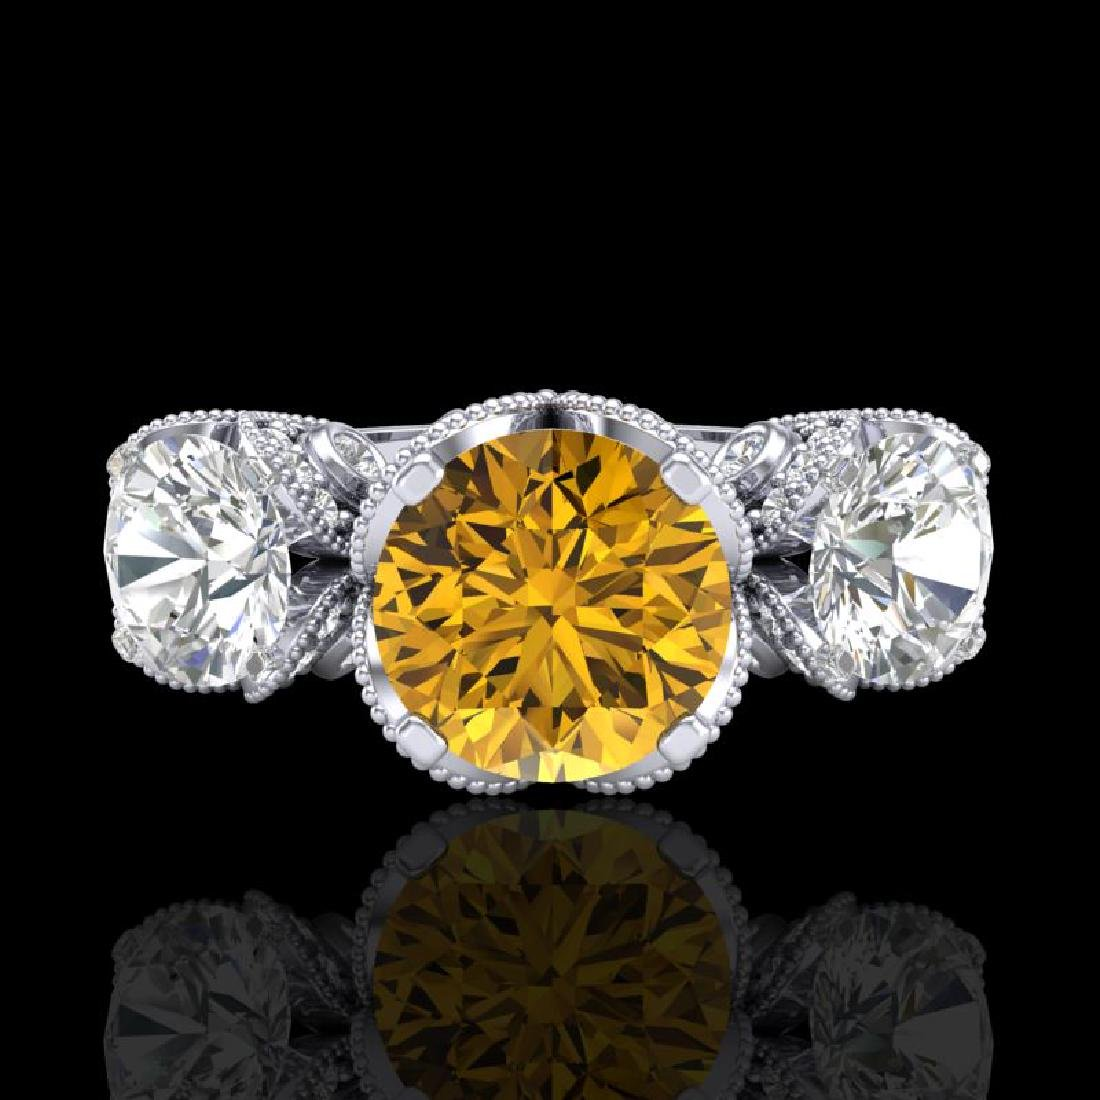 3 CTW Intense Yellow Diamond Solitaire Art Deco 3 Stone - 2